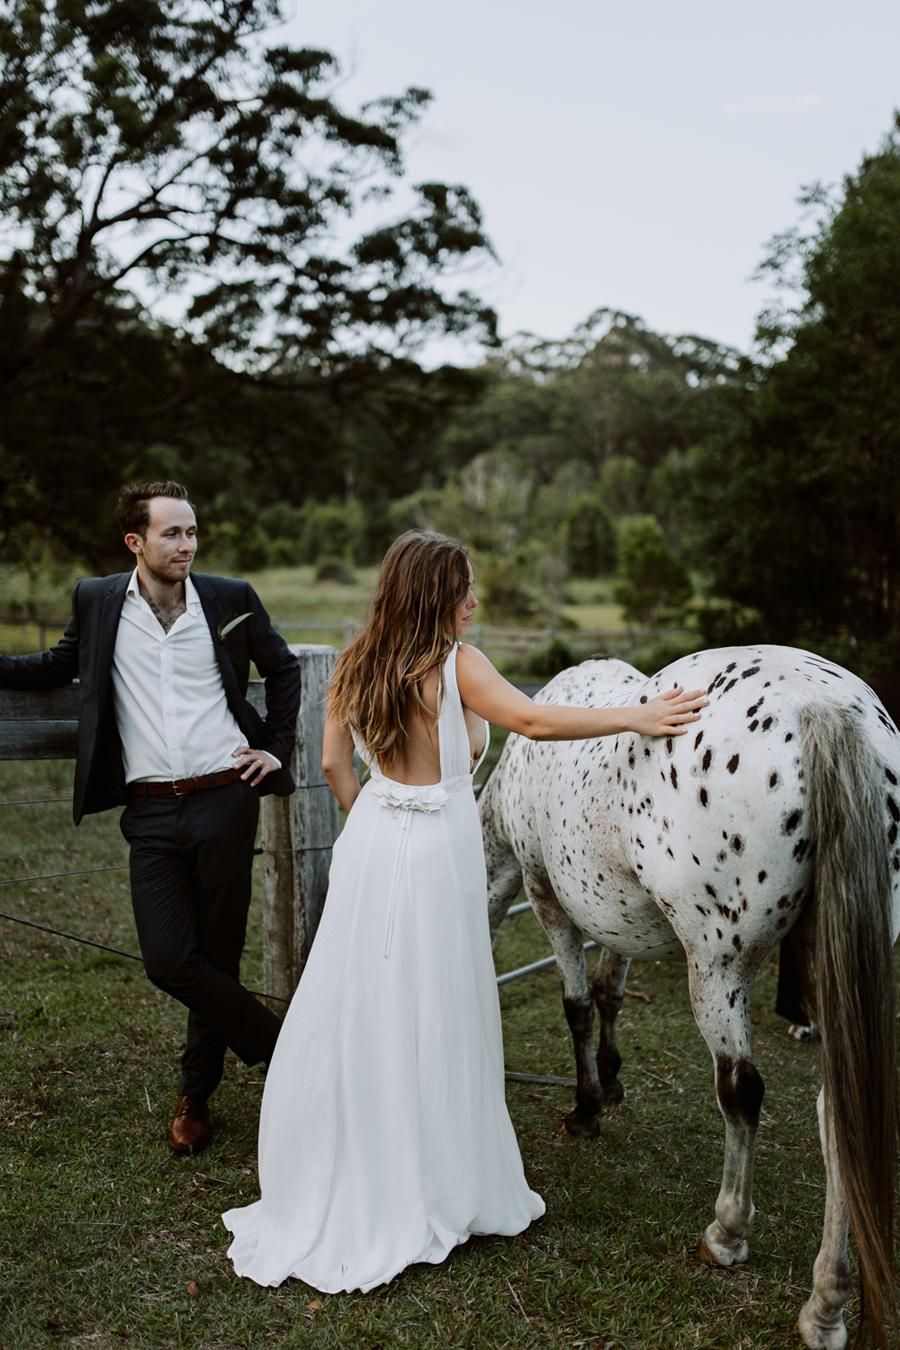 113-byron_bay_wedding_photographer.jpg